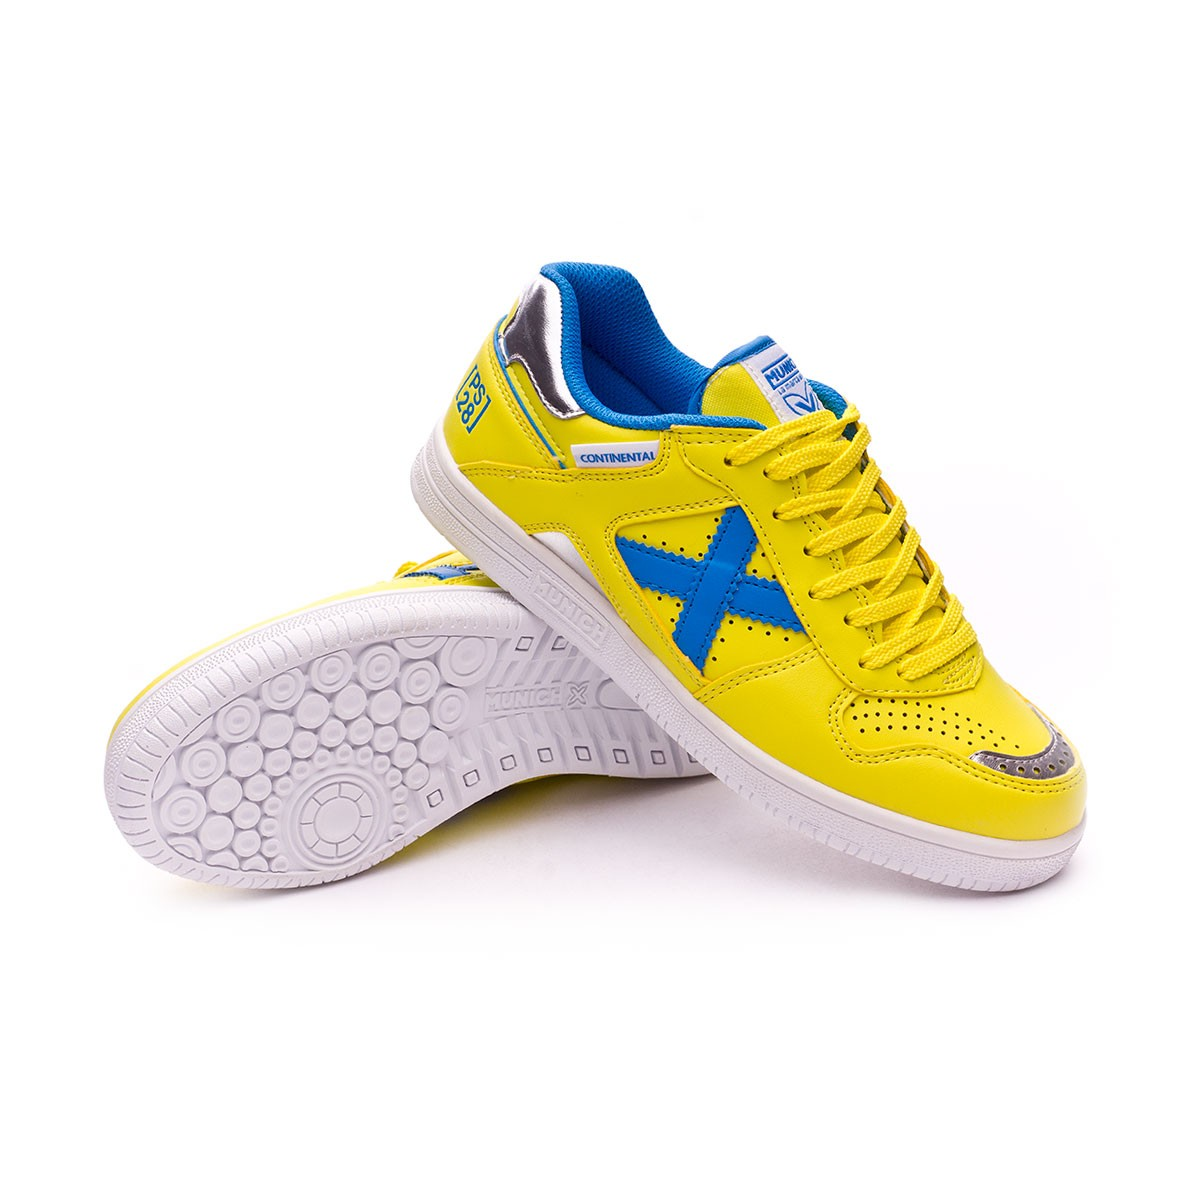 a0d508d5a17 Futsal Boot Munich Kids Continental V2 Paco Sedano Yellow-Blue - Football  store Fútbol Emotion